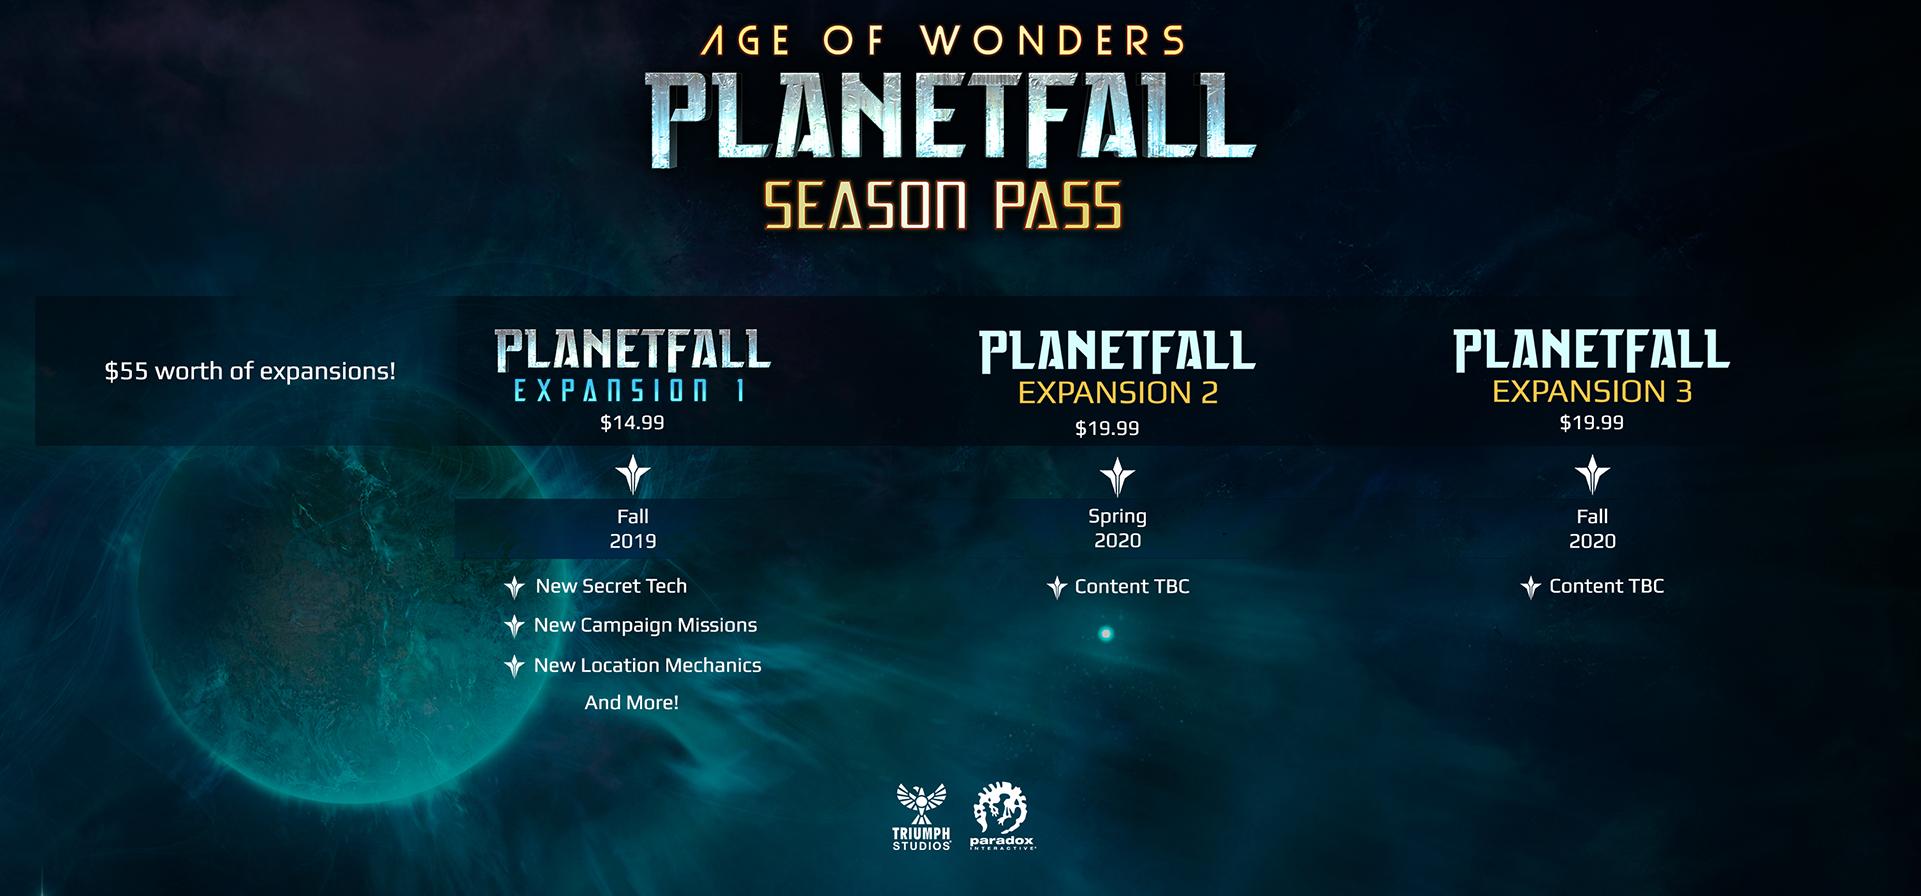 Age of Wonders: Planetfall FAQ | Paradox Interactive Forums